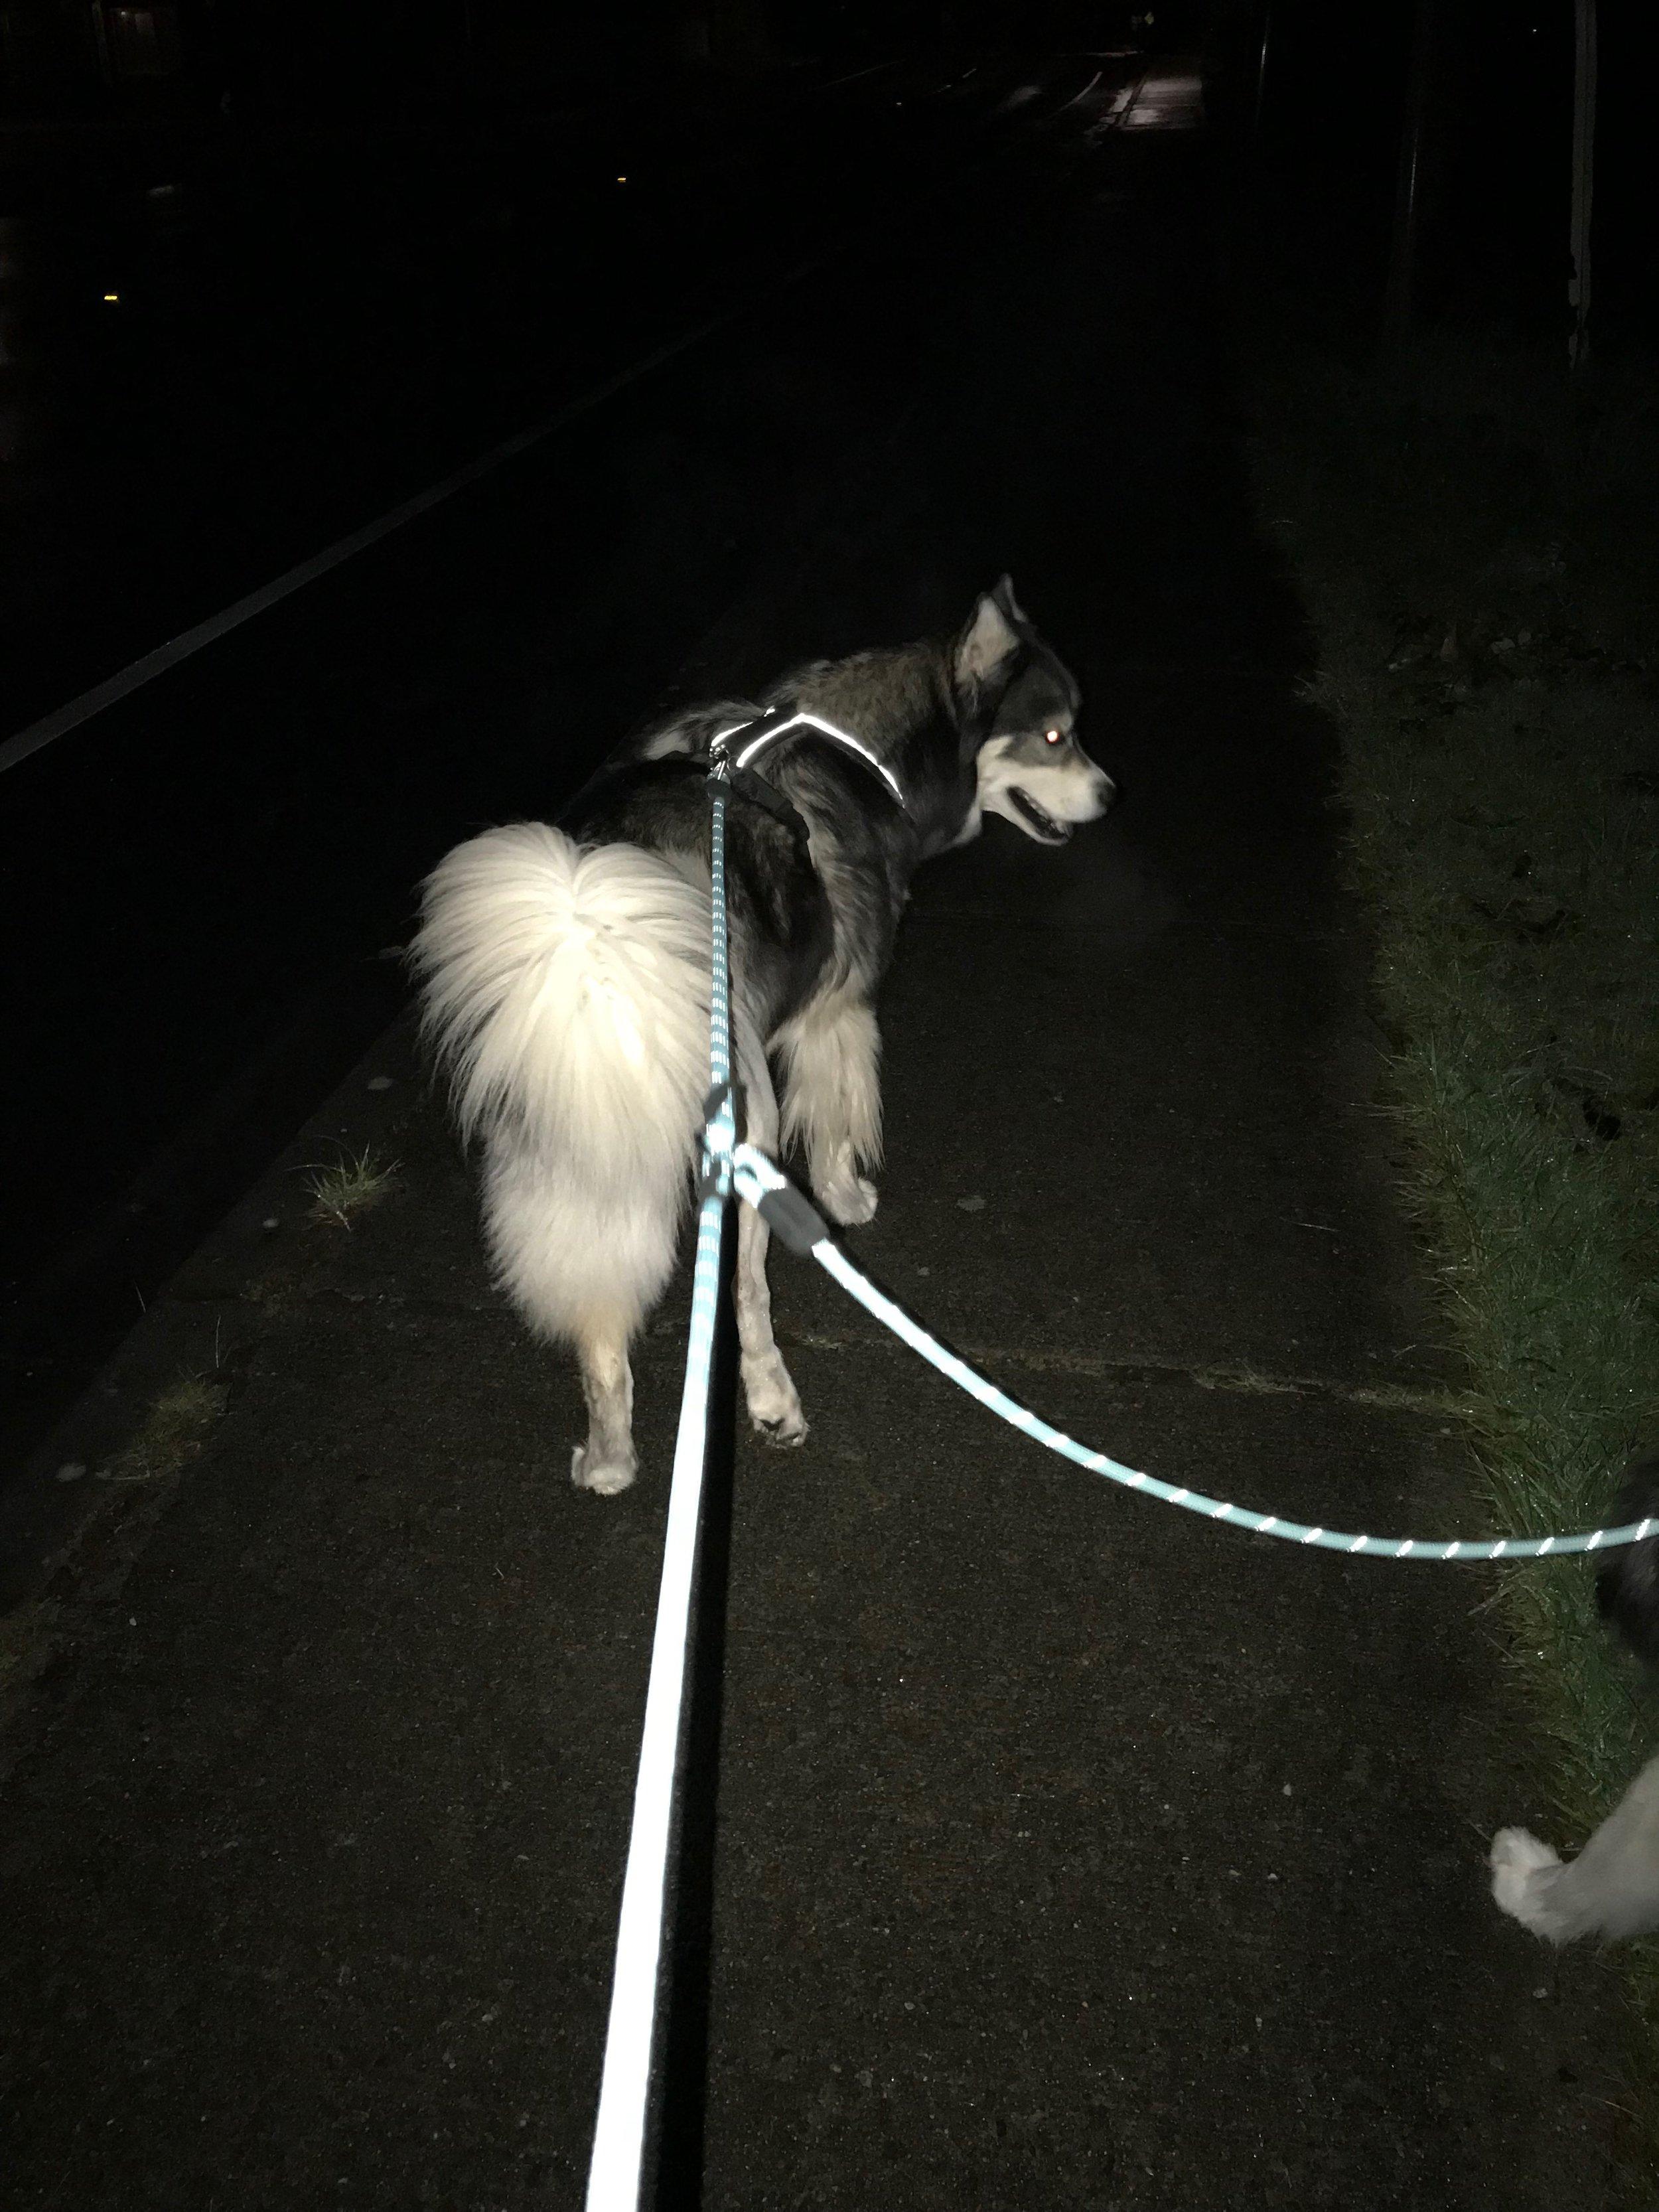 Nighttime walk